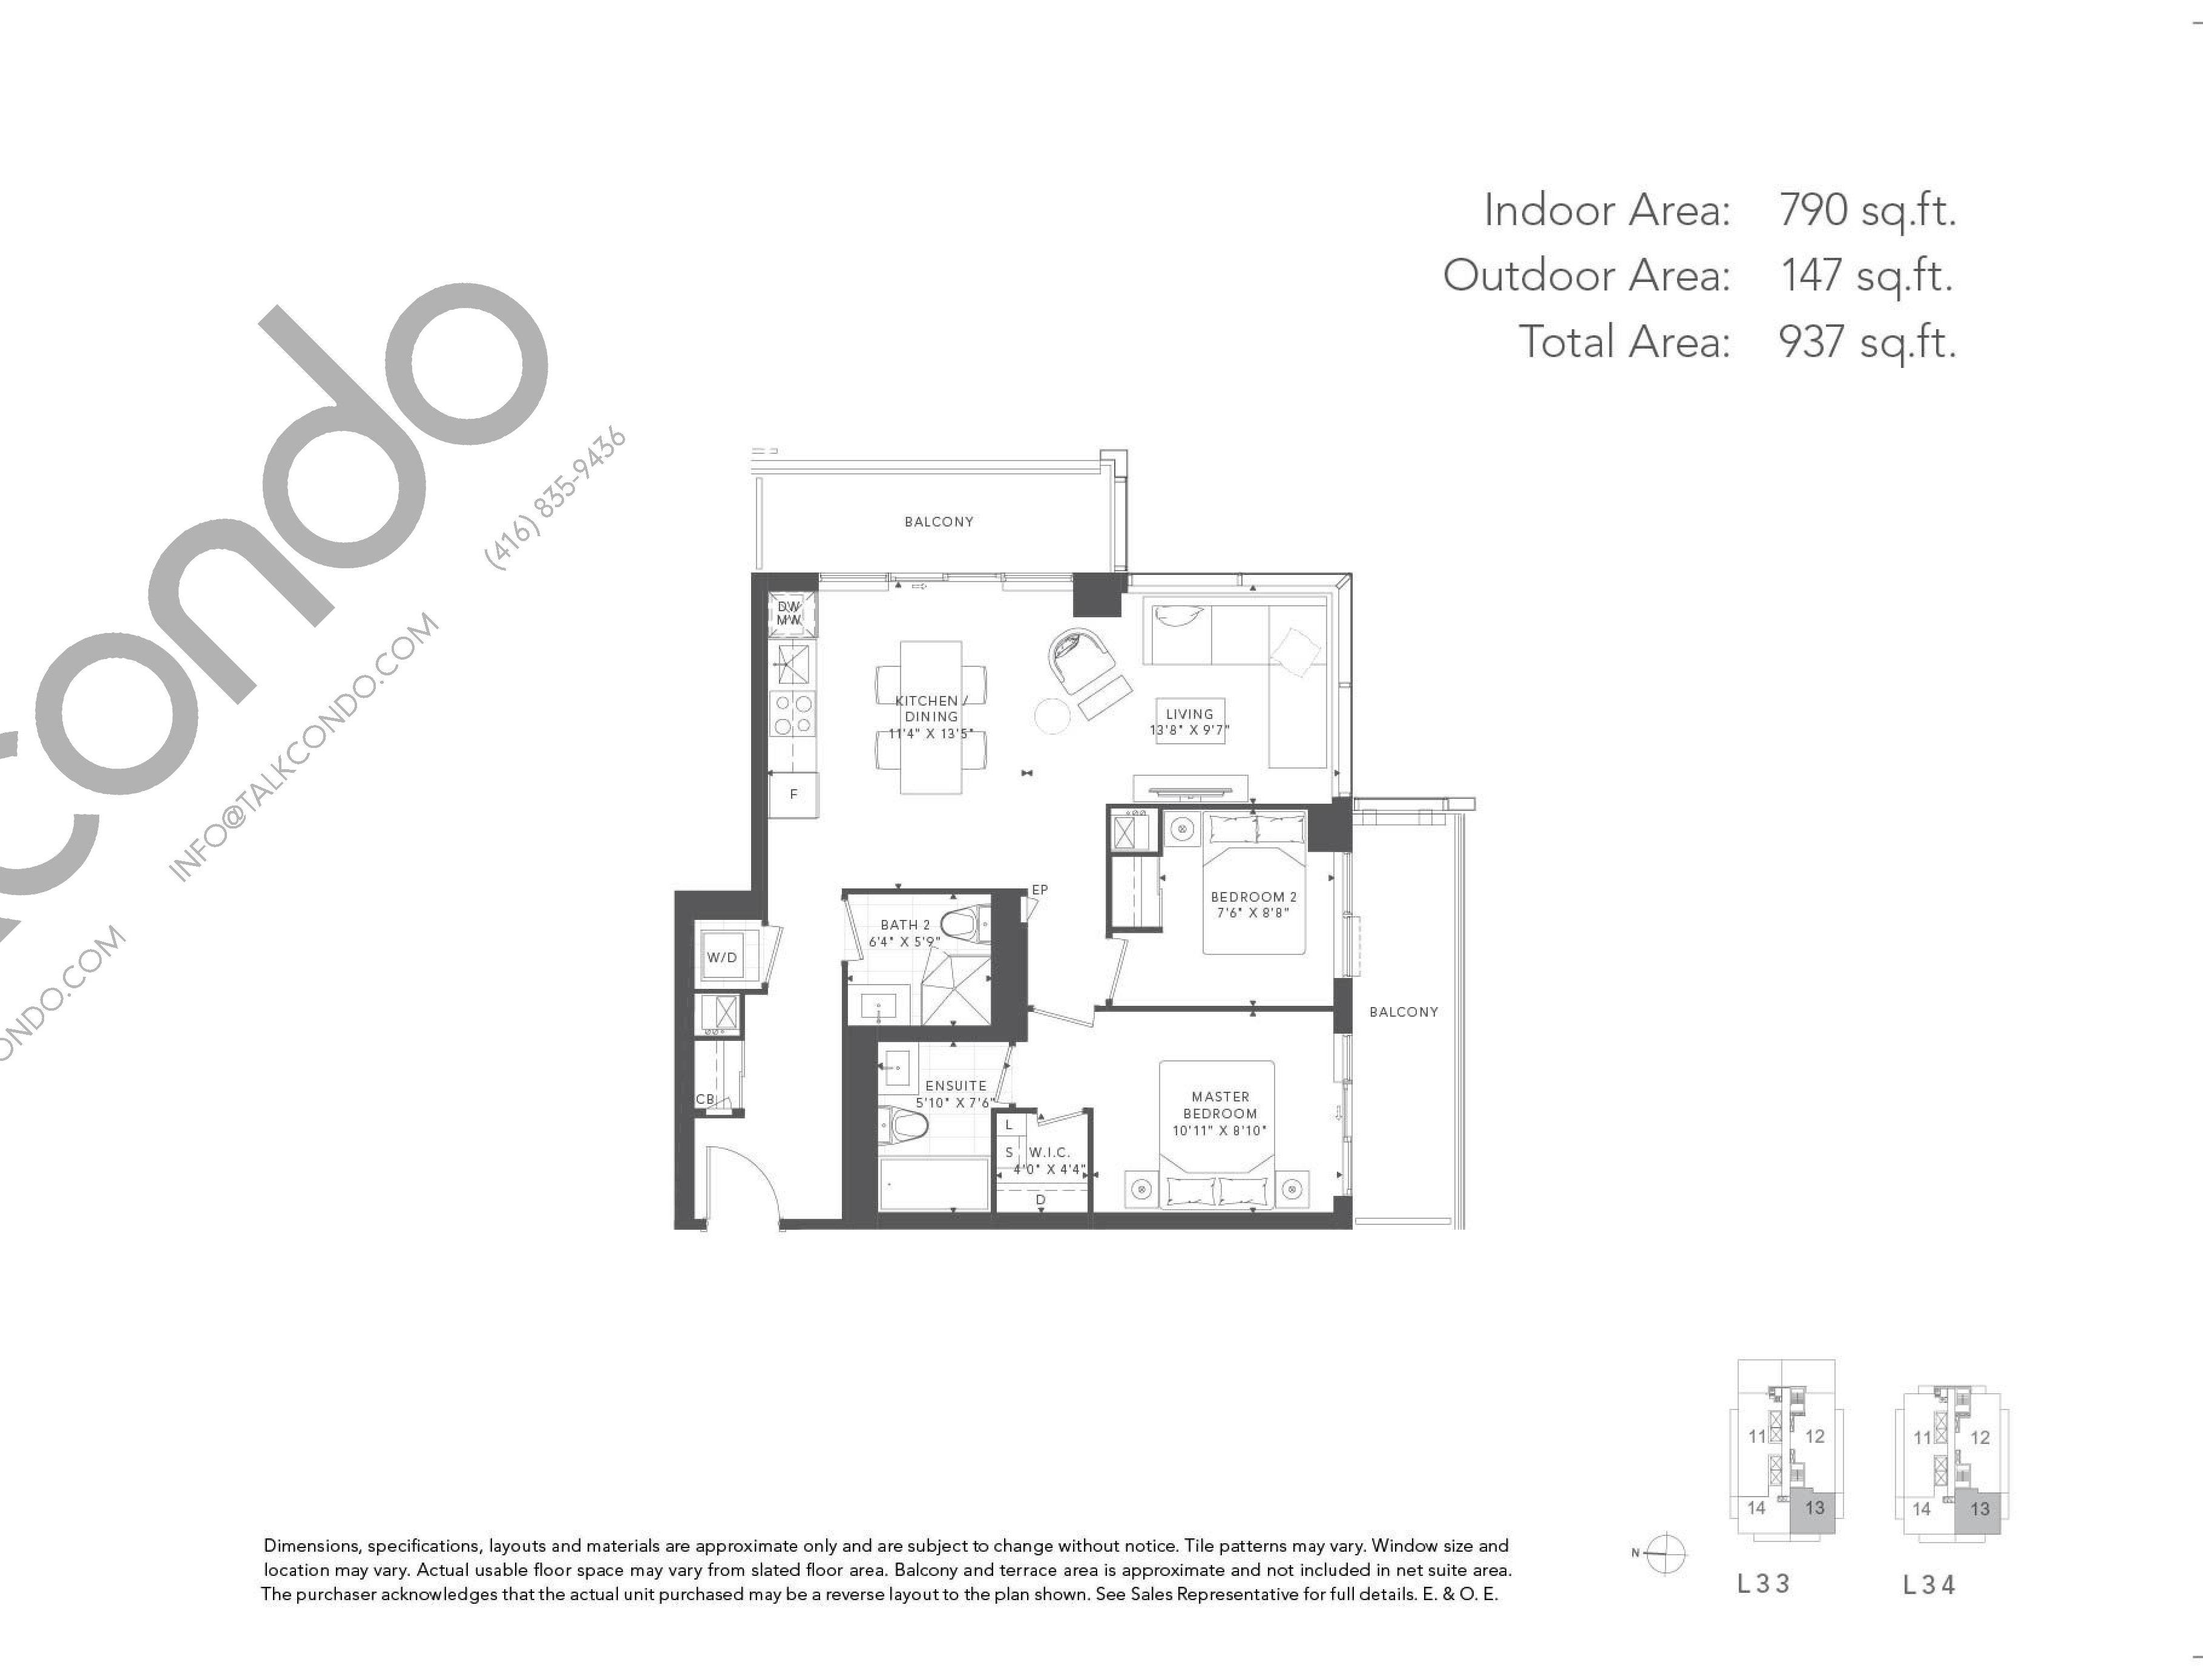 Cedar Floor Plan at T1 at M2M Condos - 790 sq.ft